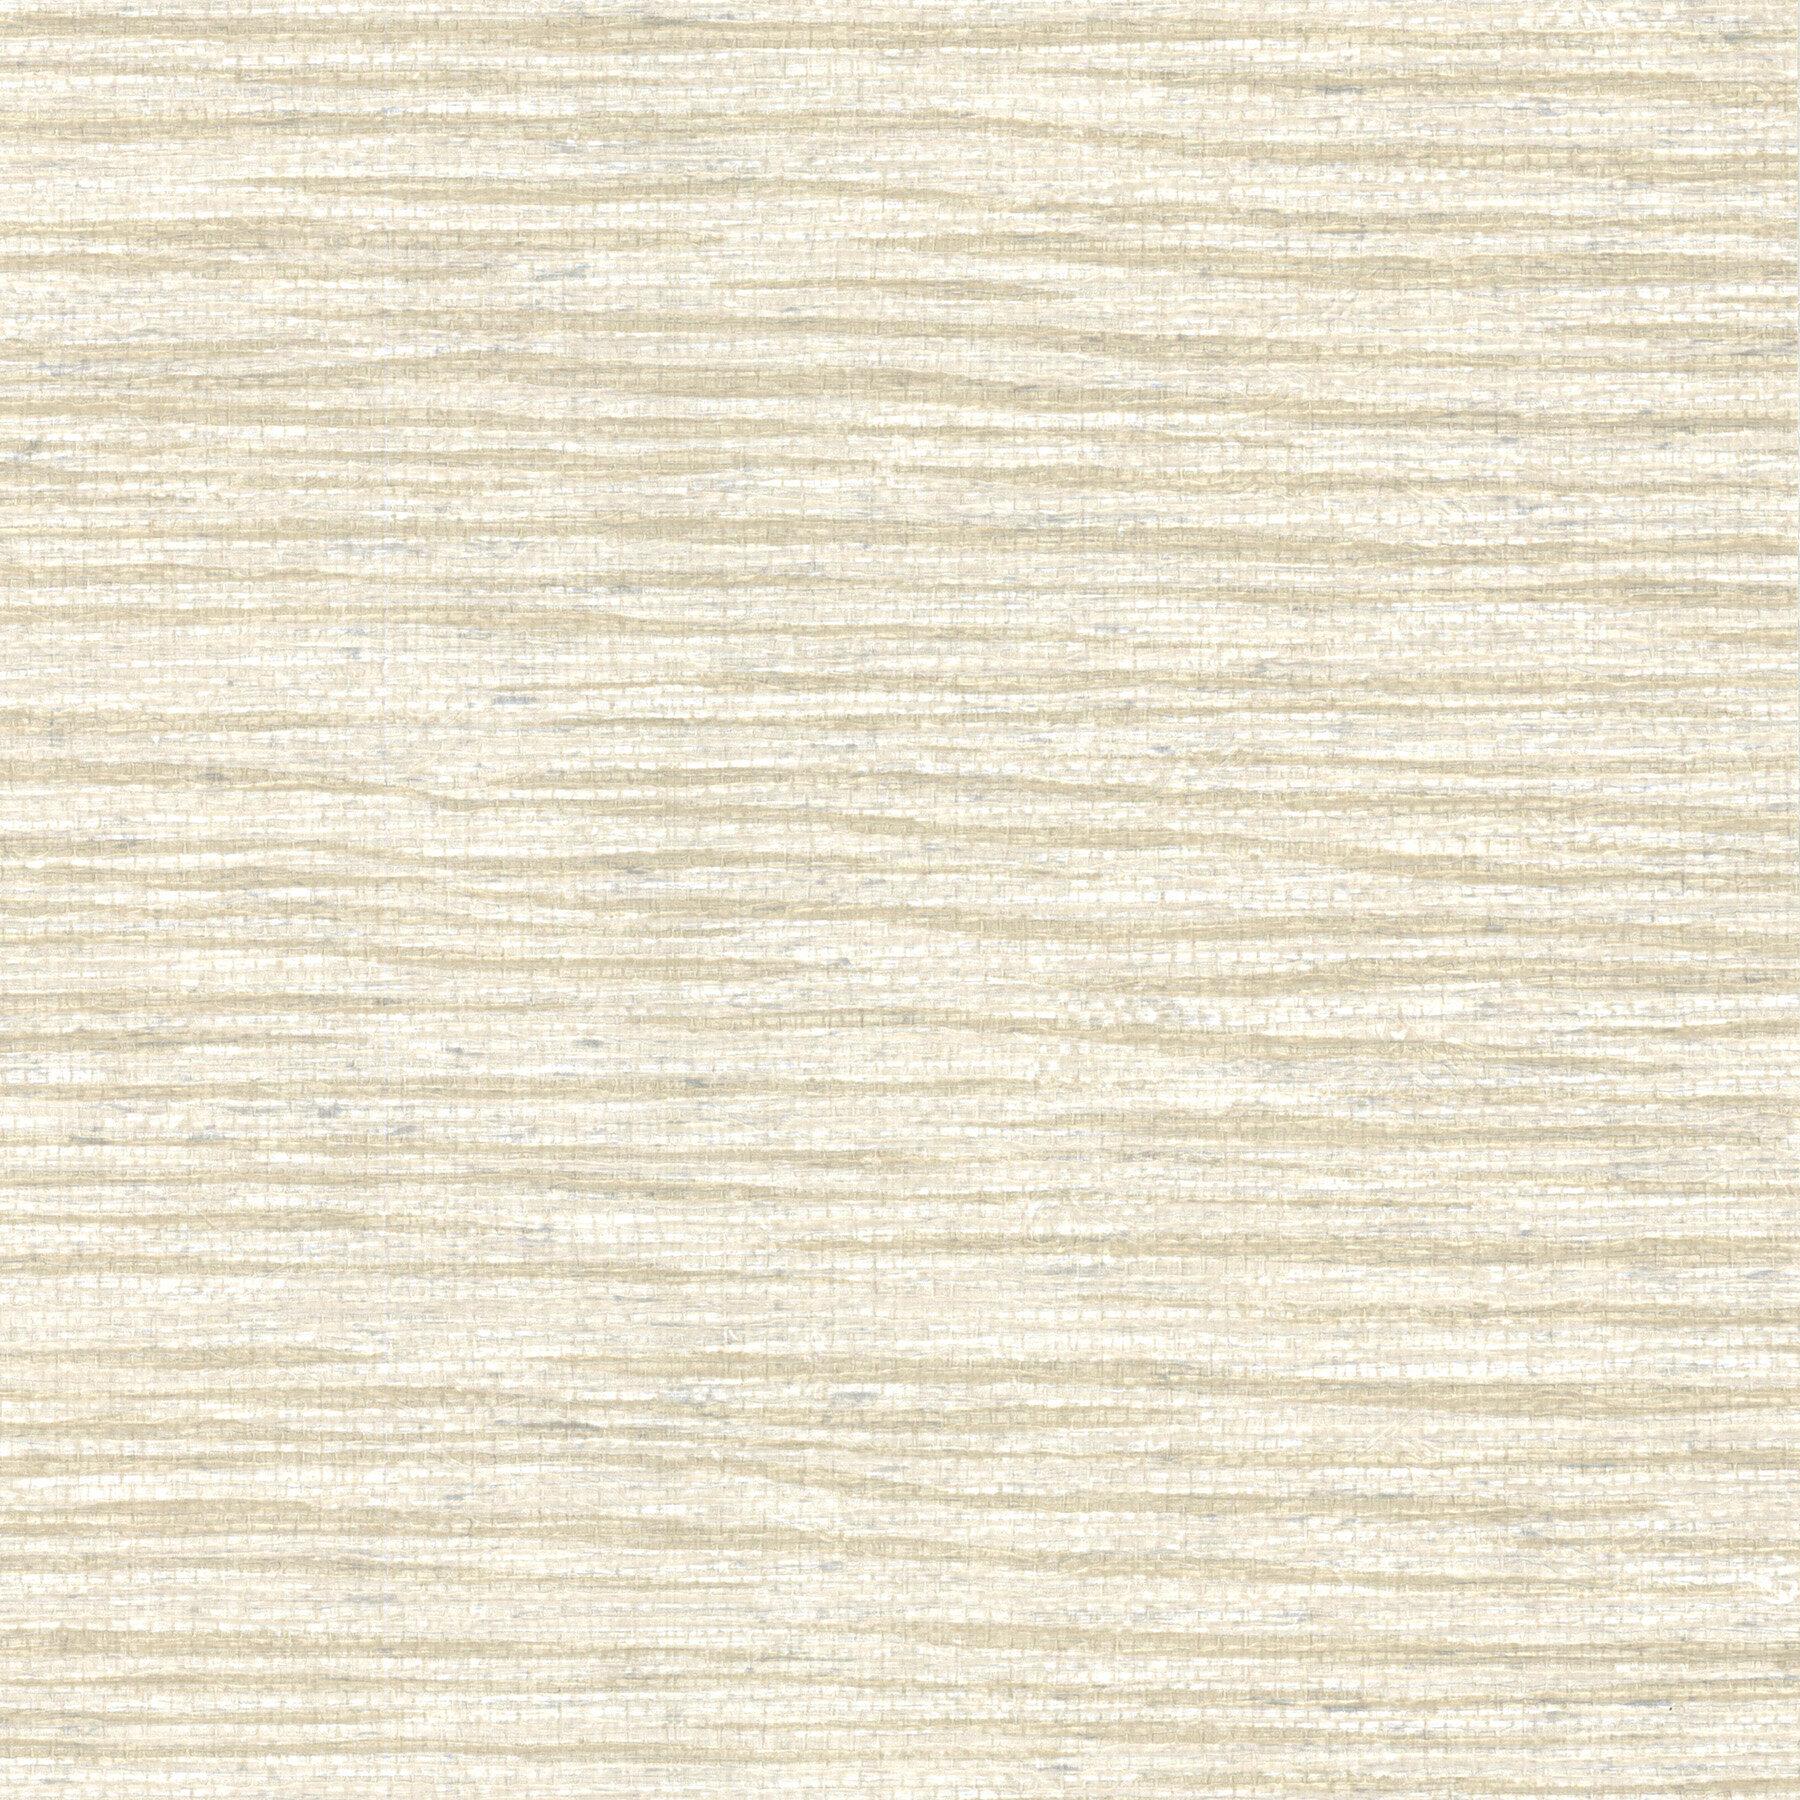 Faux Grasscloth Wallpaper: Grasscloth Wallpaper History 2017